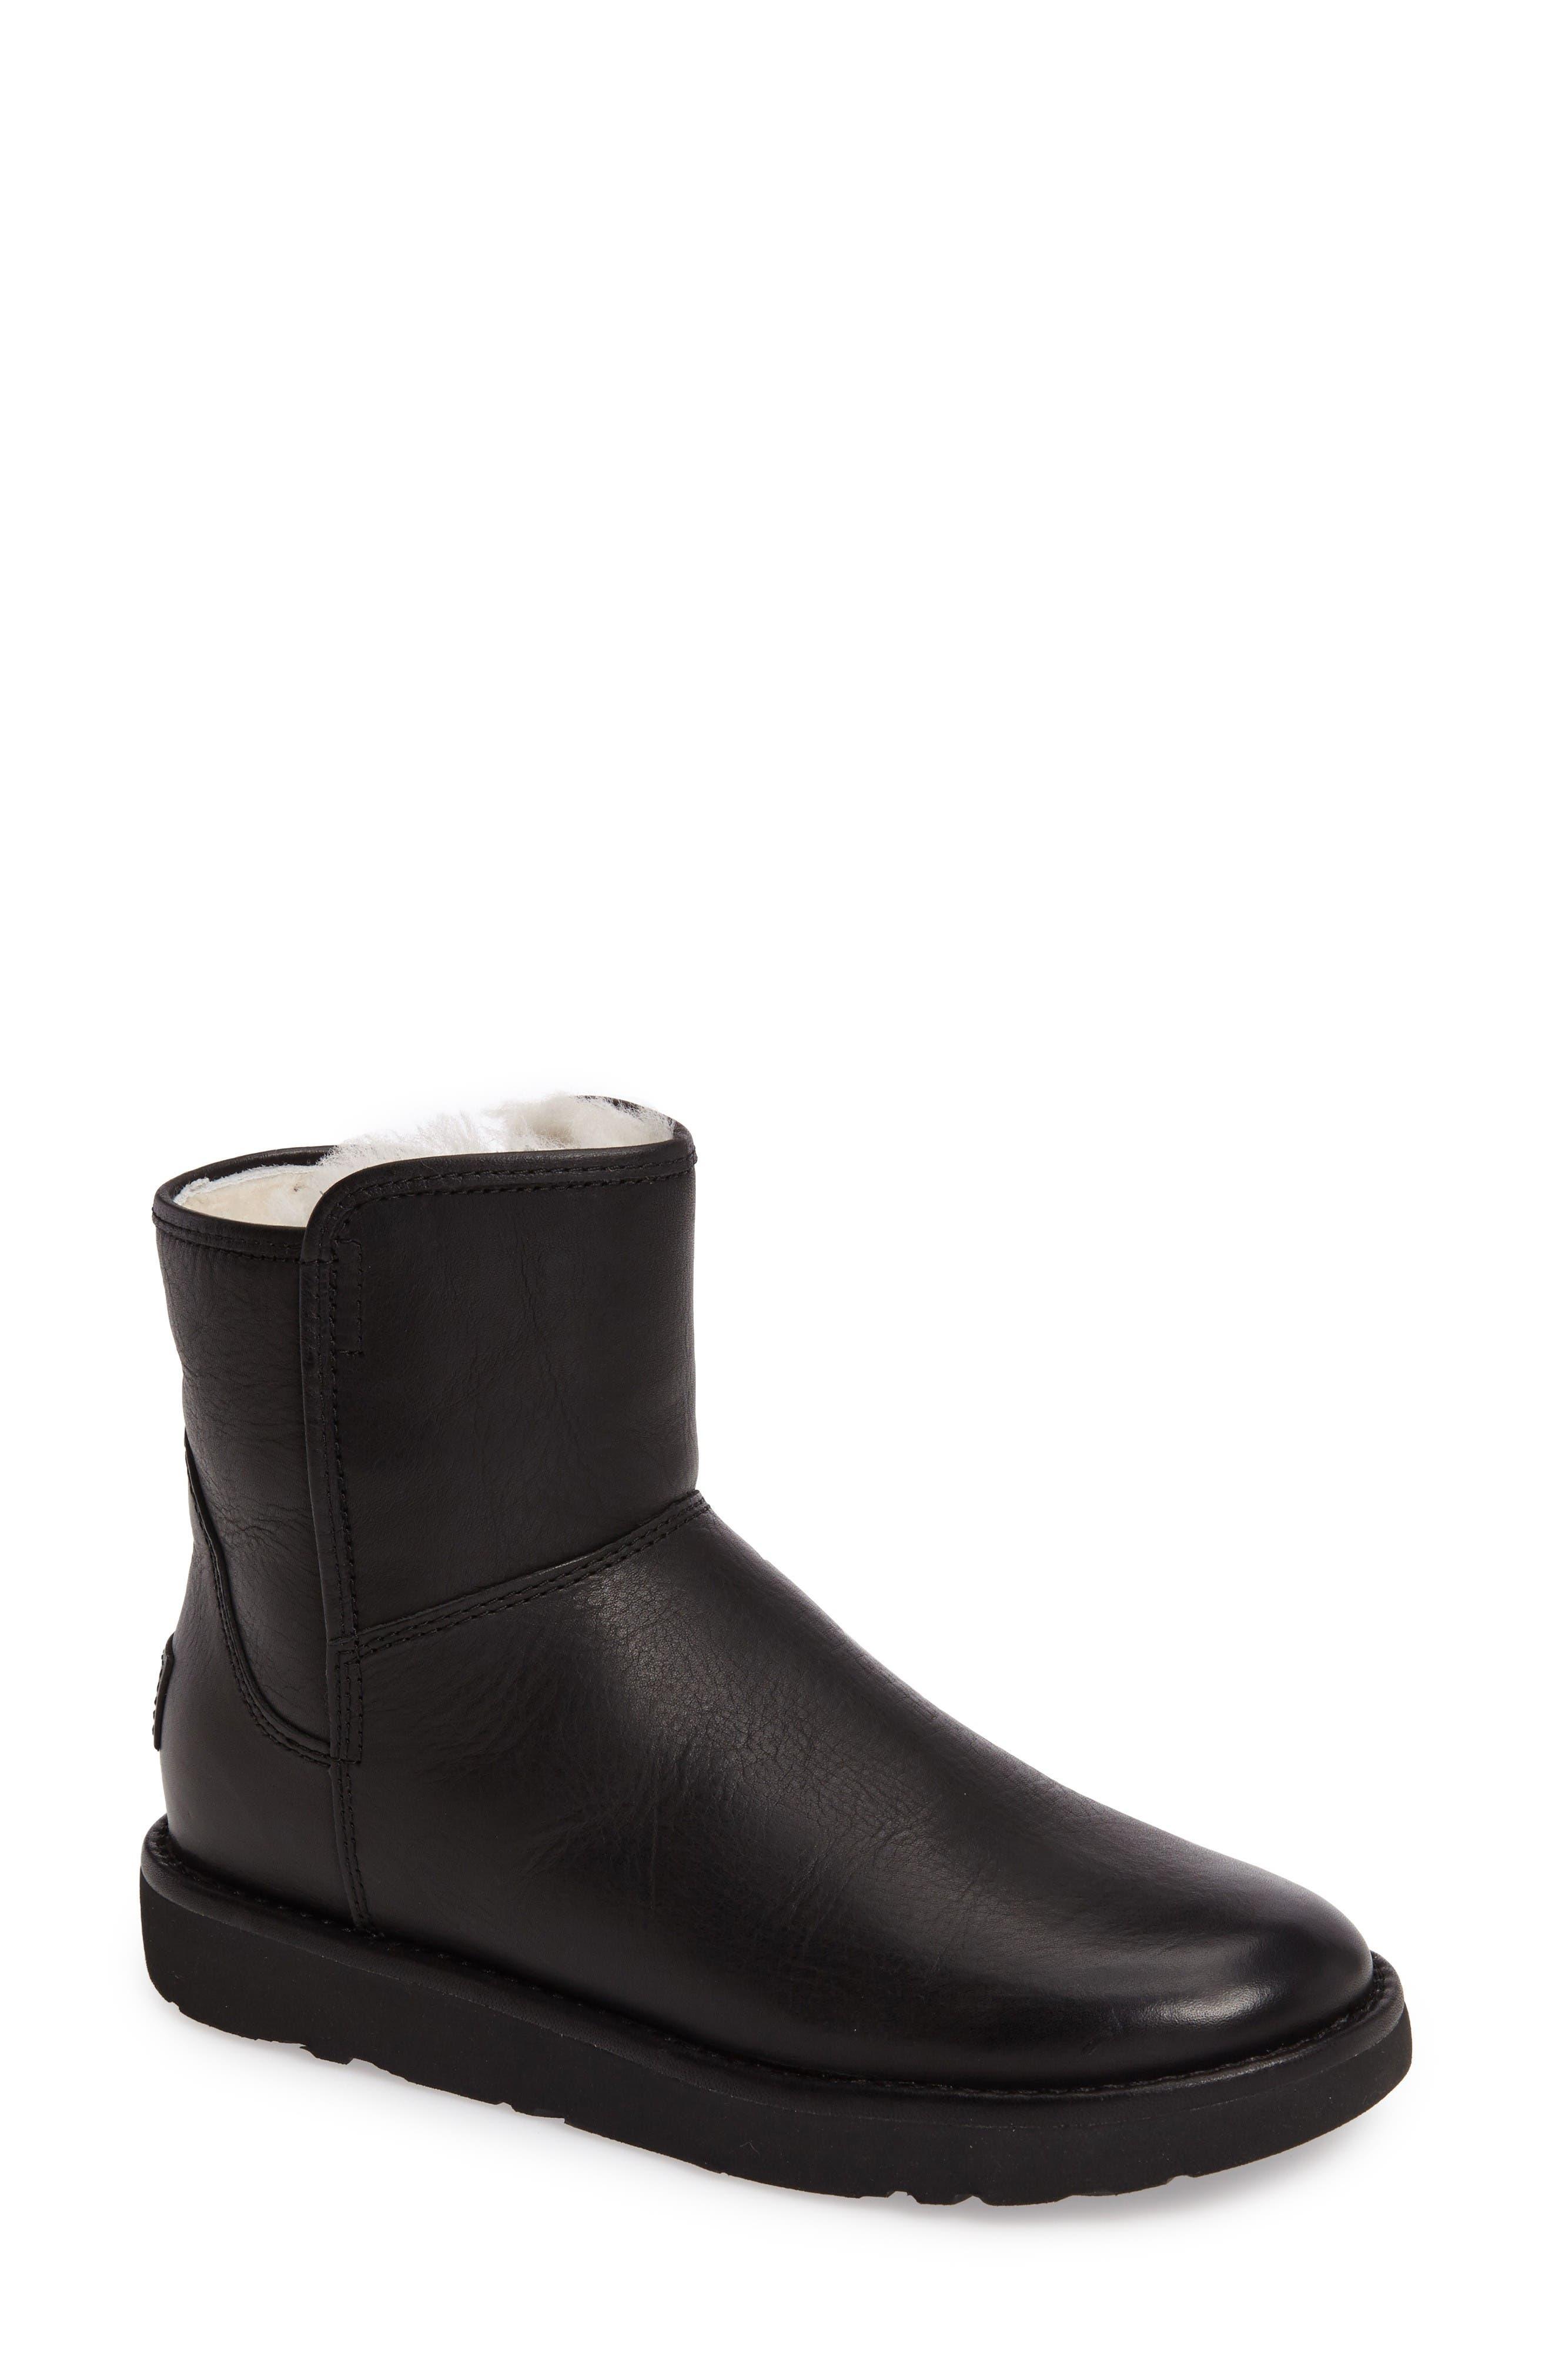 Abree Mini Boot,                             Main thumbnail 1, color,                             Black Leather